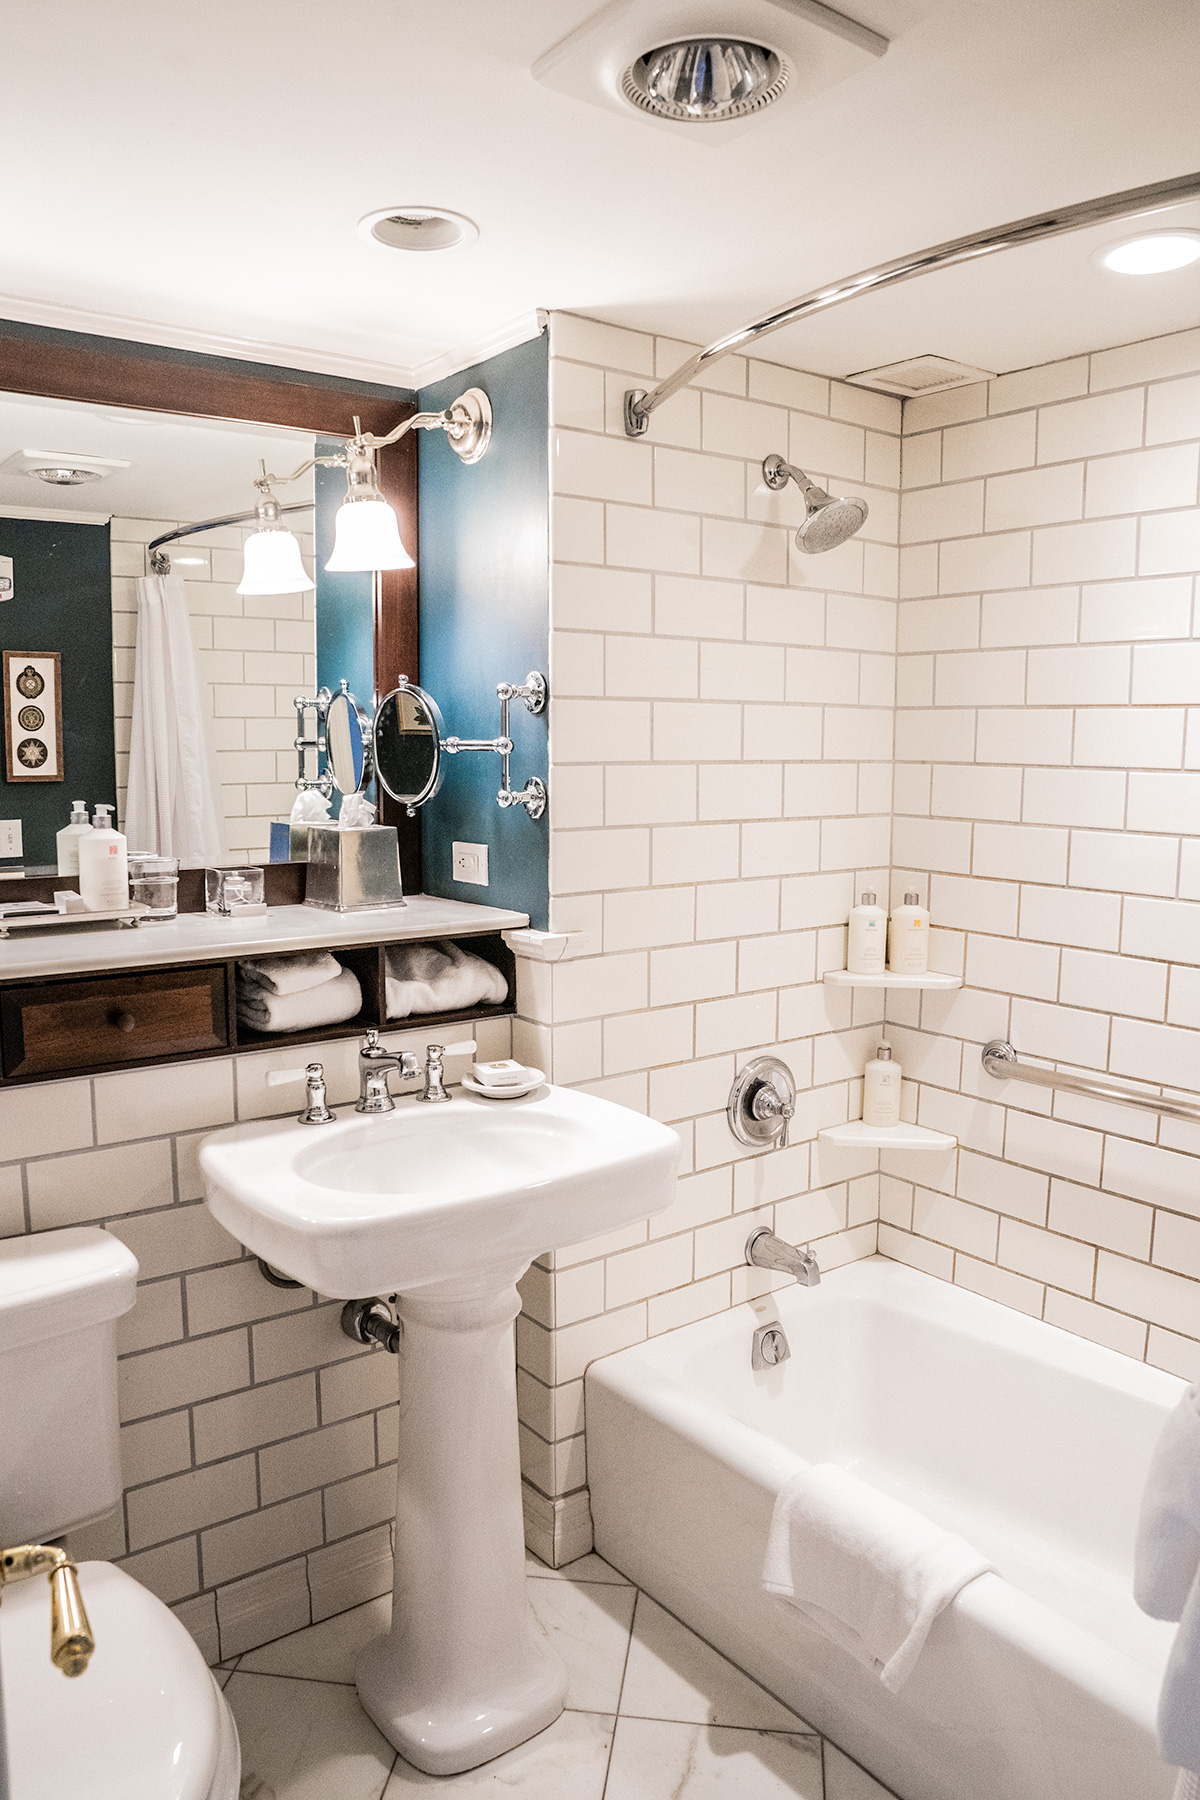 Bathroom-at-The-Woodstock-Inn-and-Resort